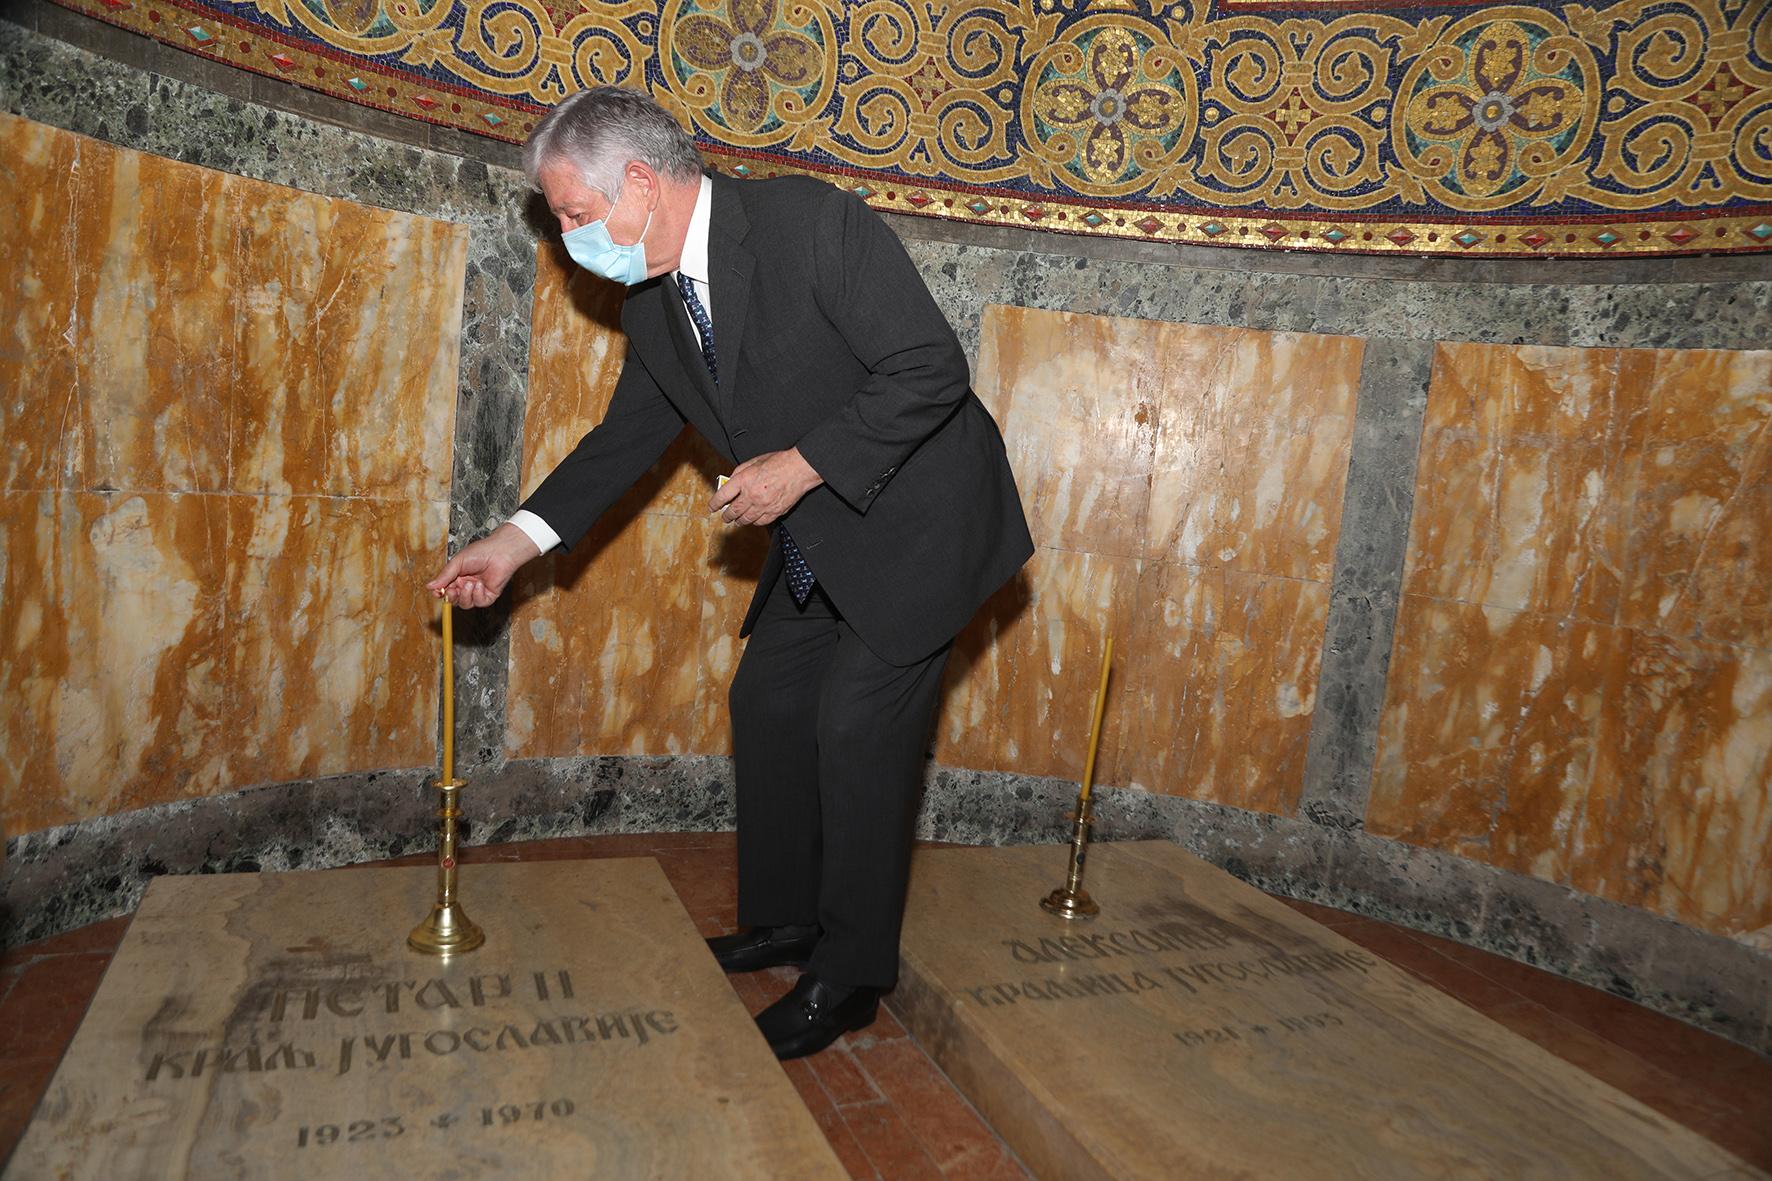 Њ.К.В. Престолонаследник Александар пали свећу на гробу свог оца, Њ.В. Краља Петра II